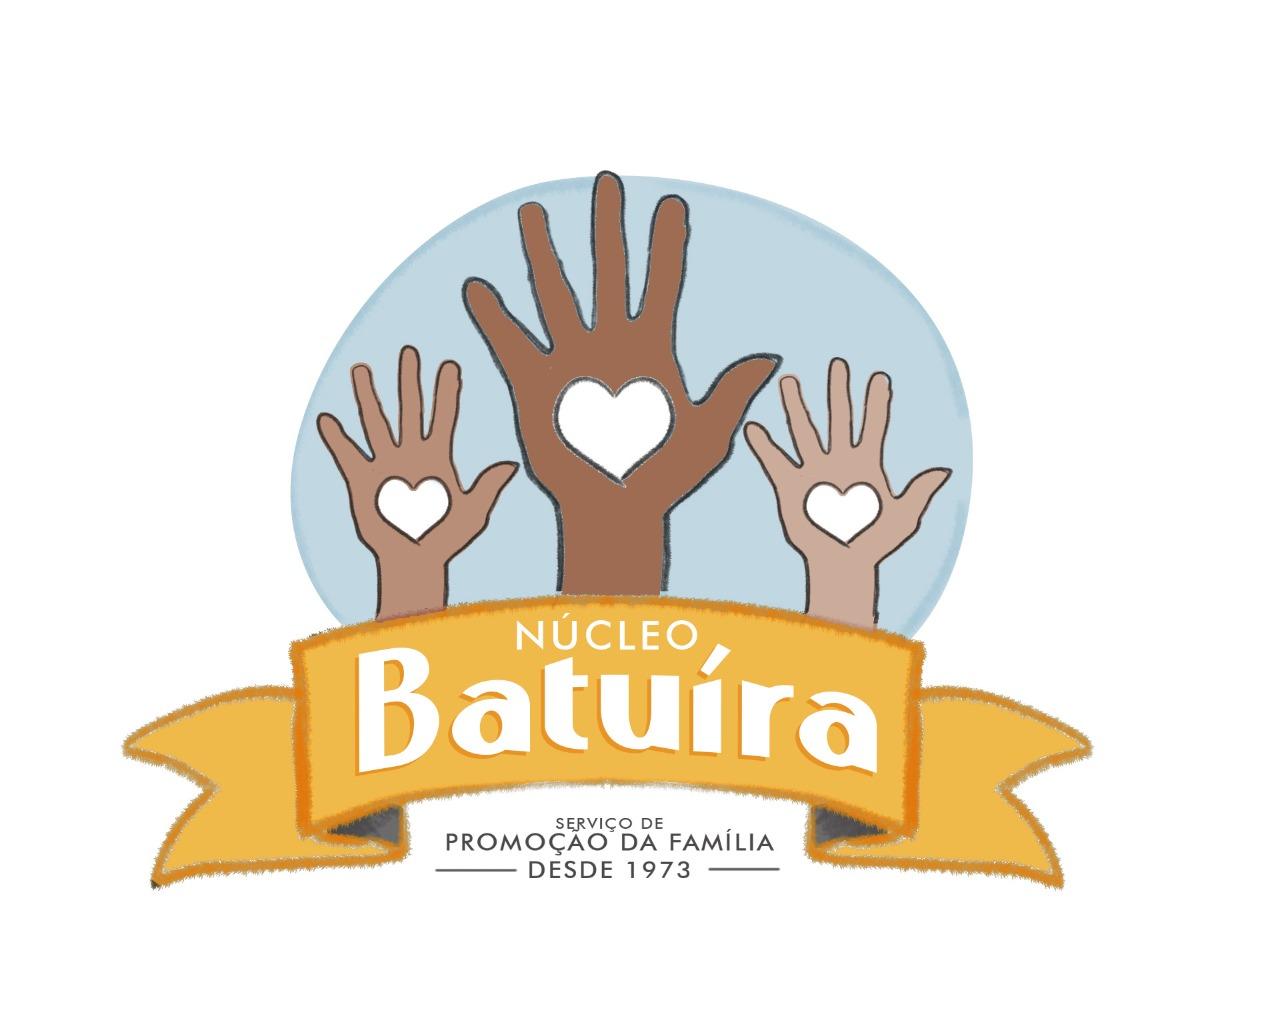 Núcleo Batuira